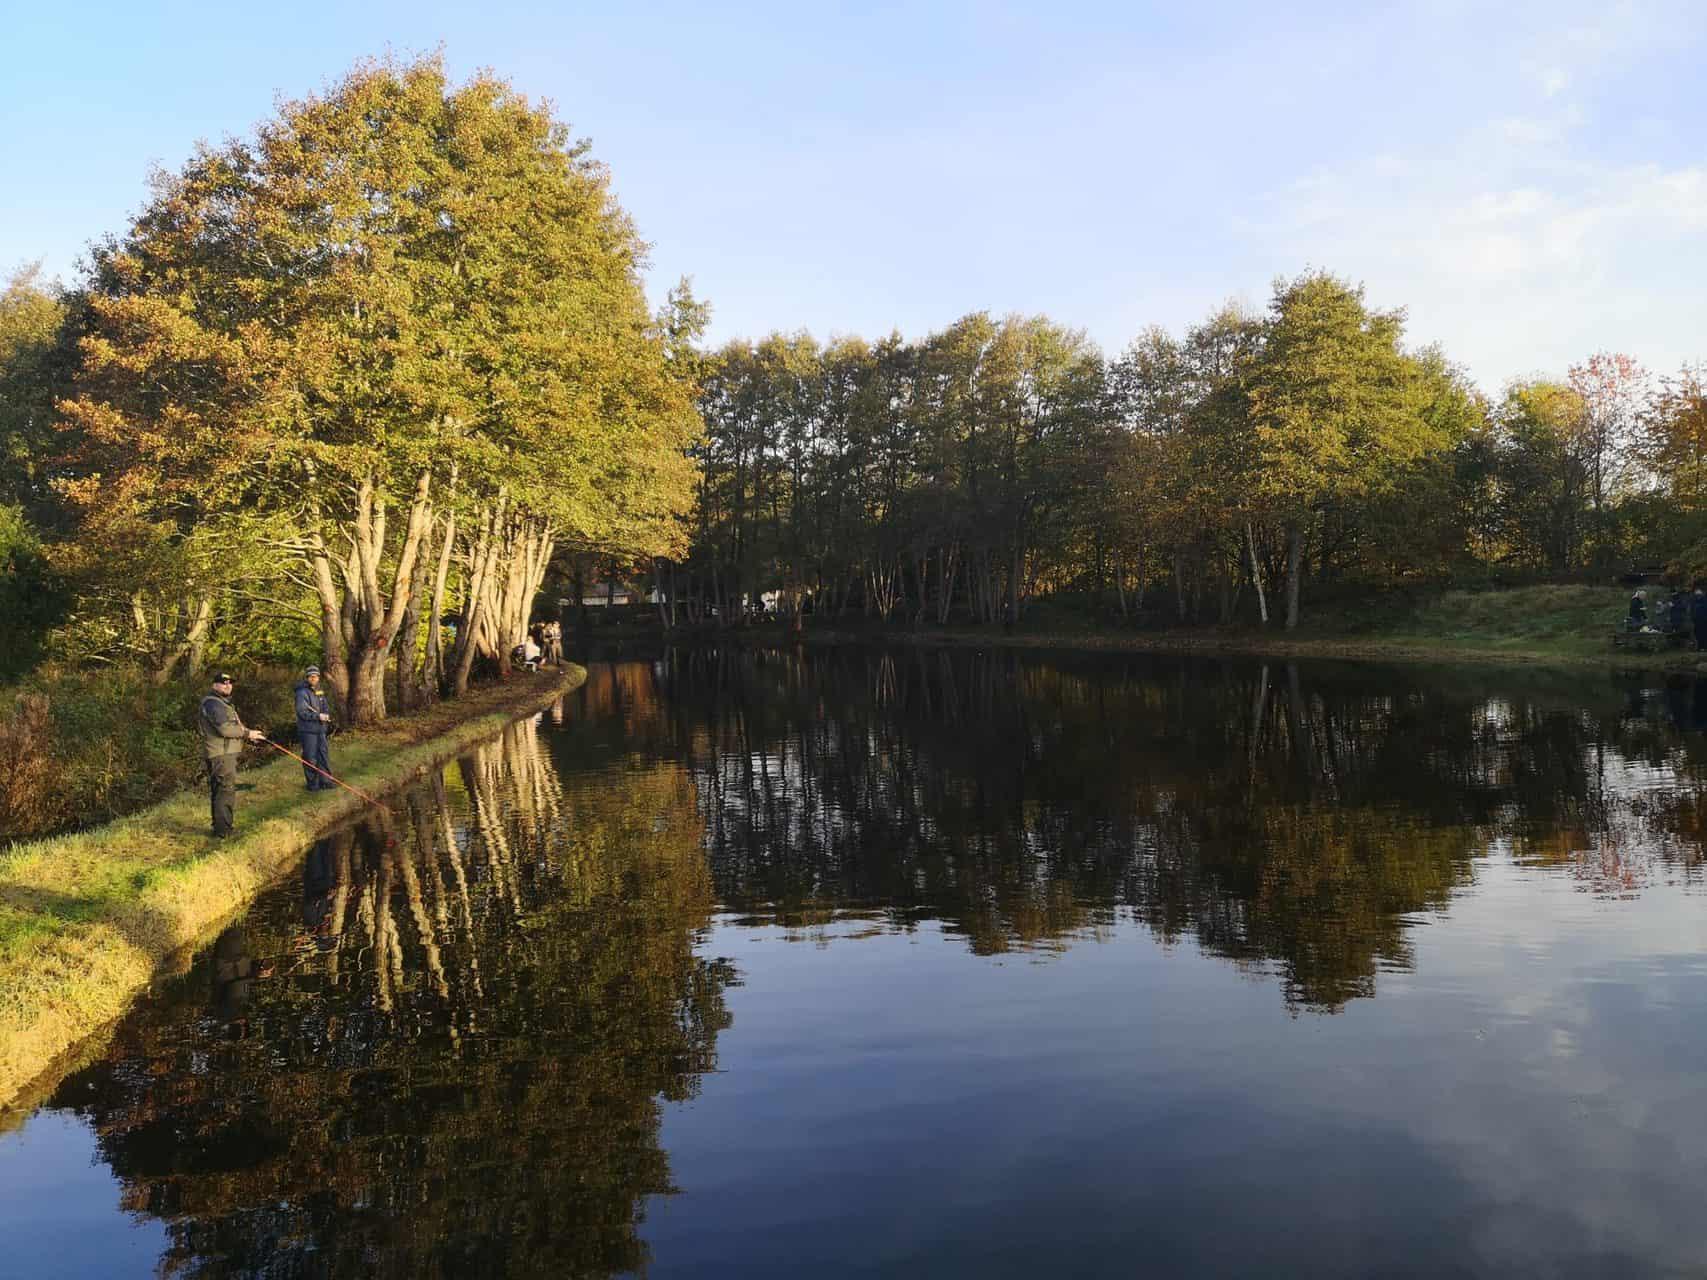 St. Restrup Put and take / fiskesø Aalborg Nibe